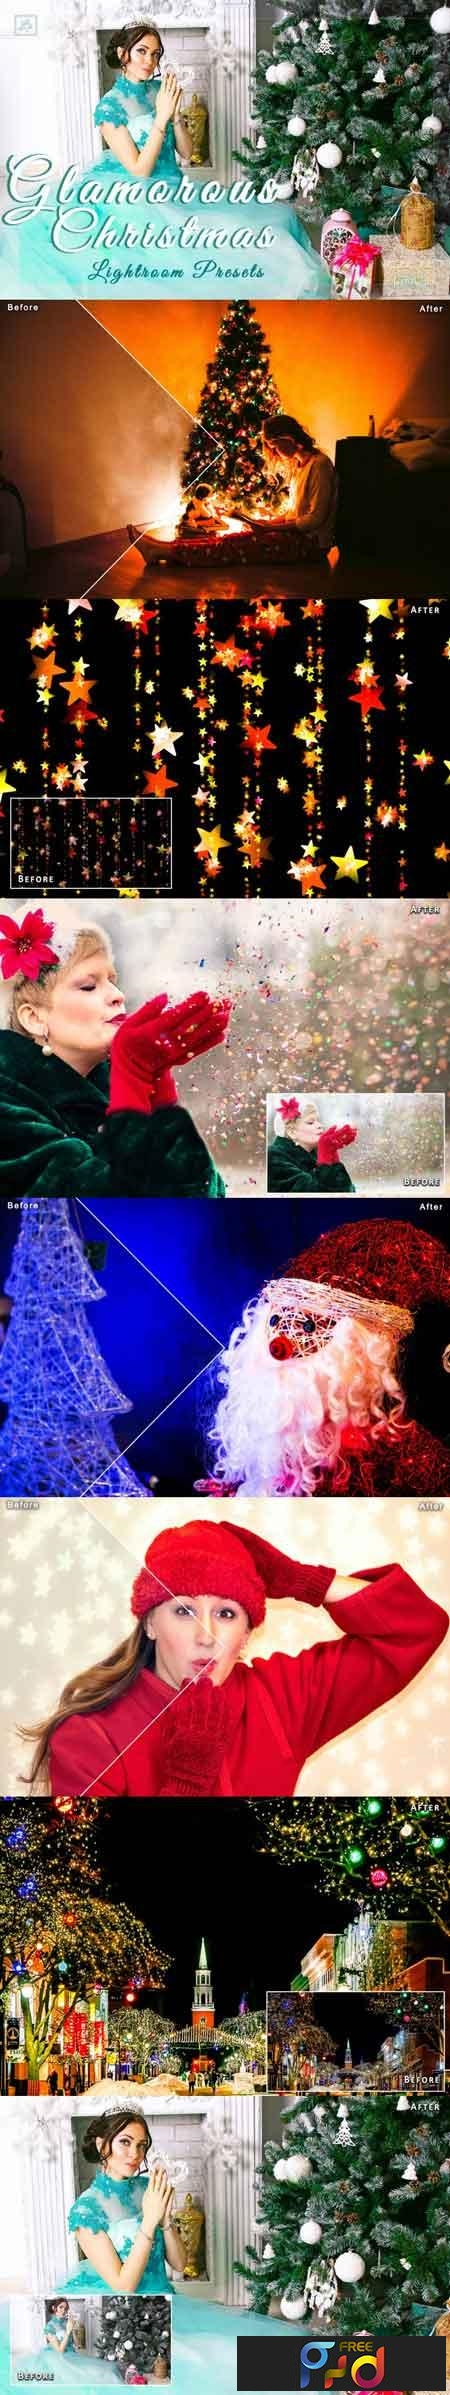 Glamorous christmas lightroom presets 3511379 1